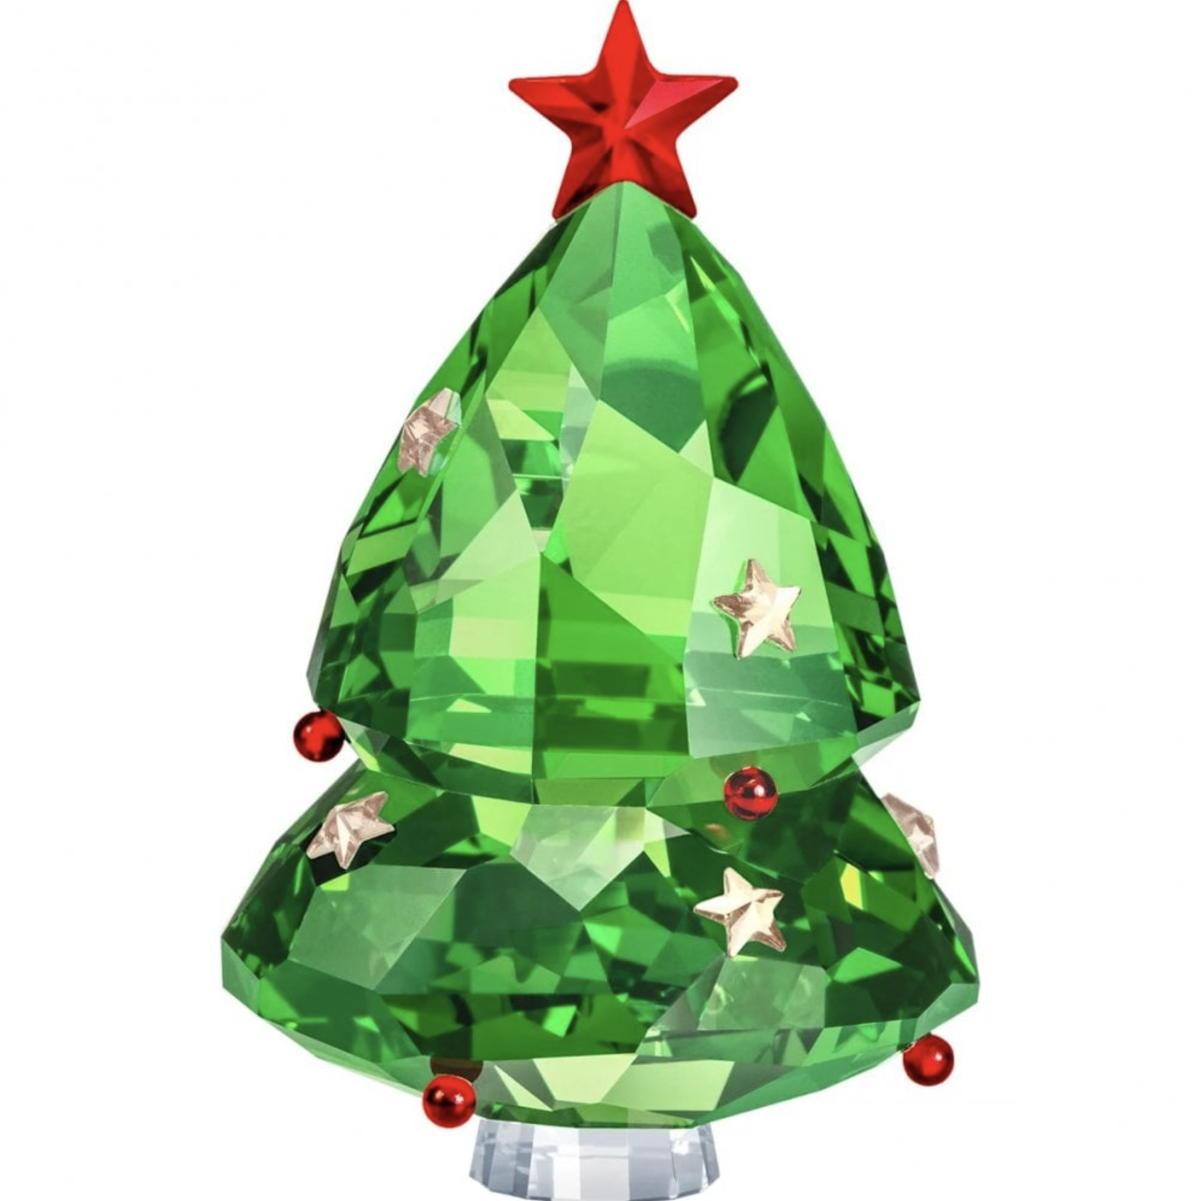 addobbi-natalizi-cristallo-foto-idee-costi-16